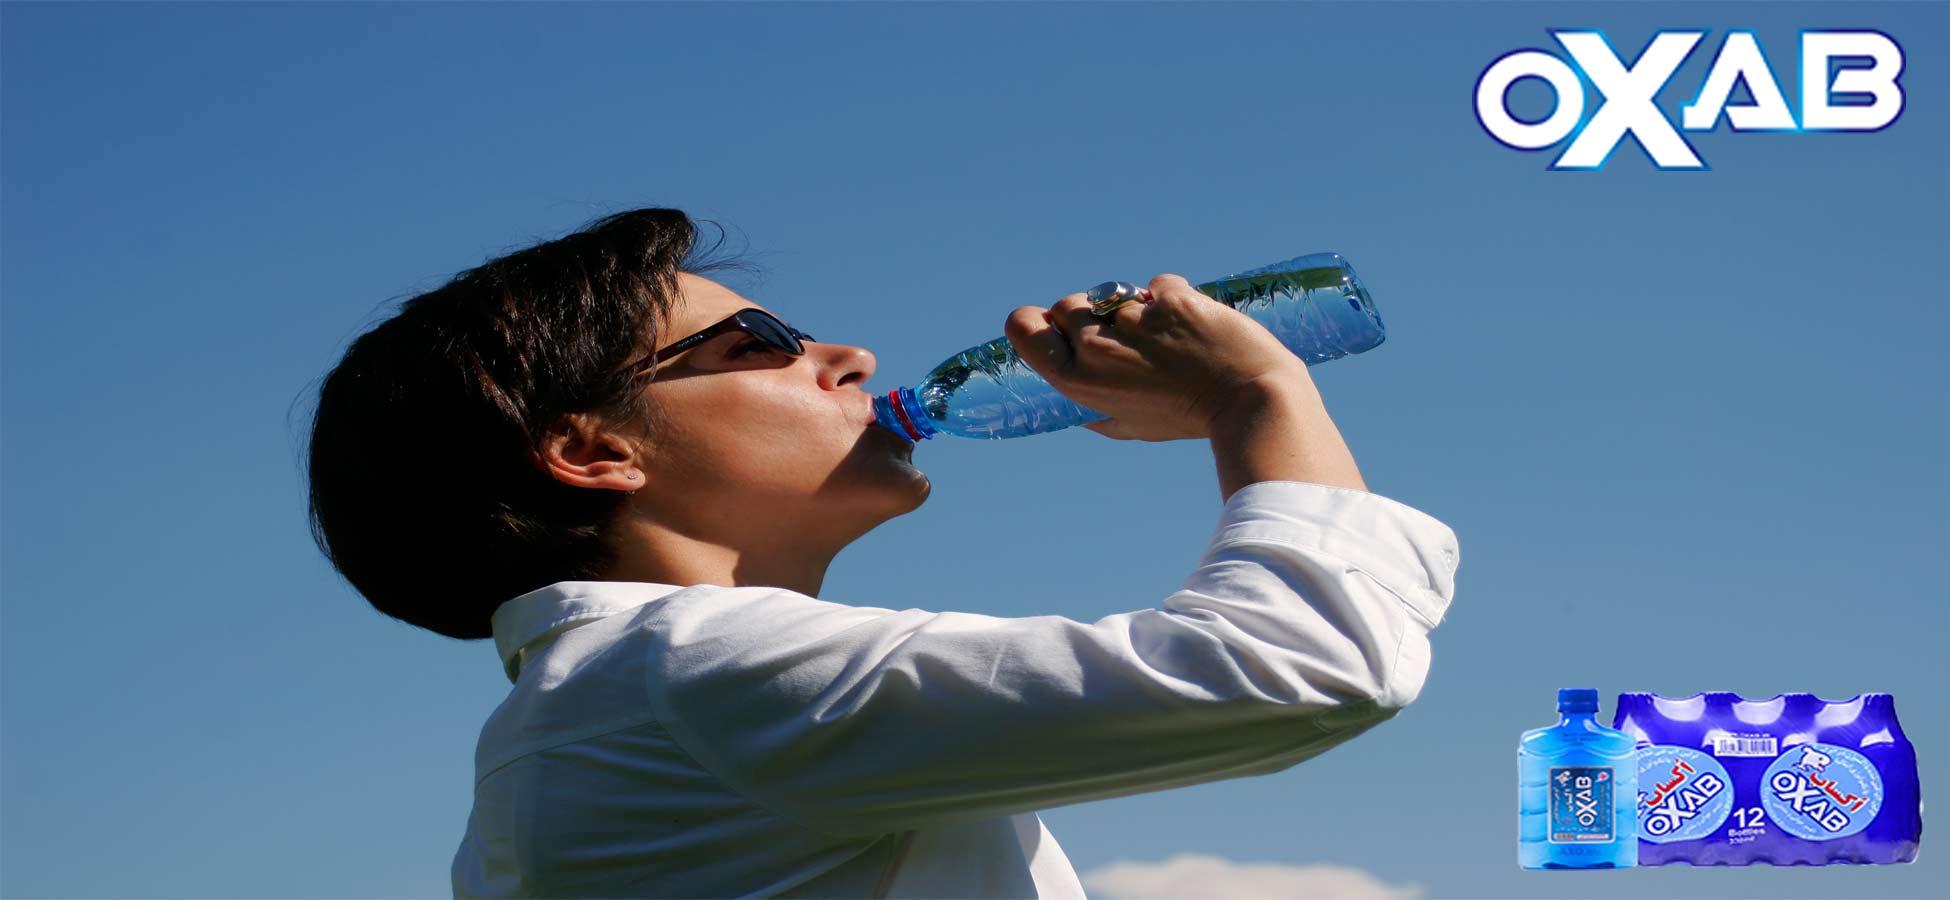 نوشیدن آب به سبک ژاپنی ها